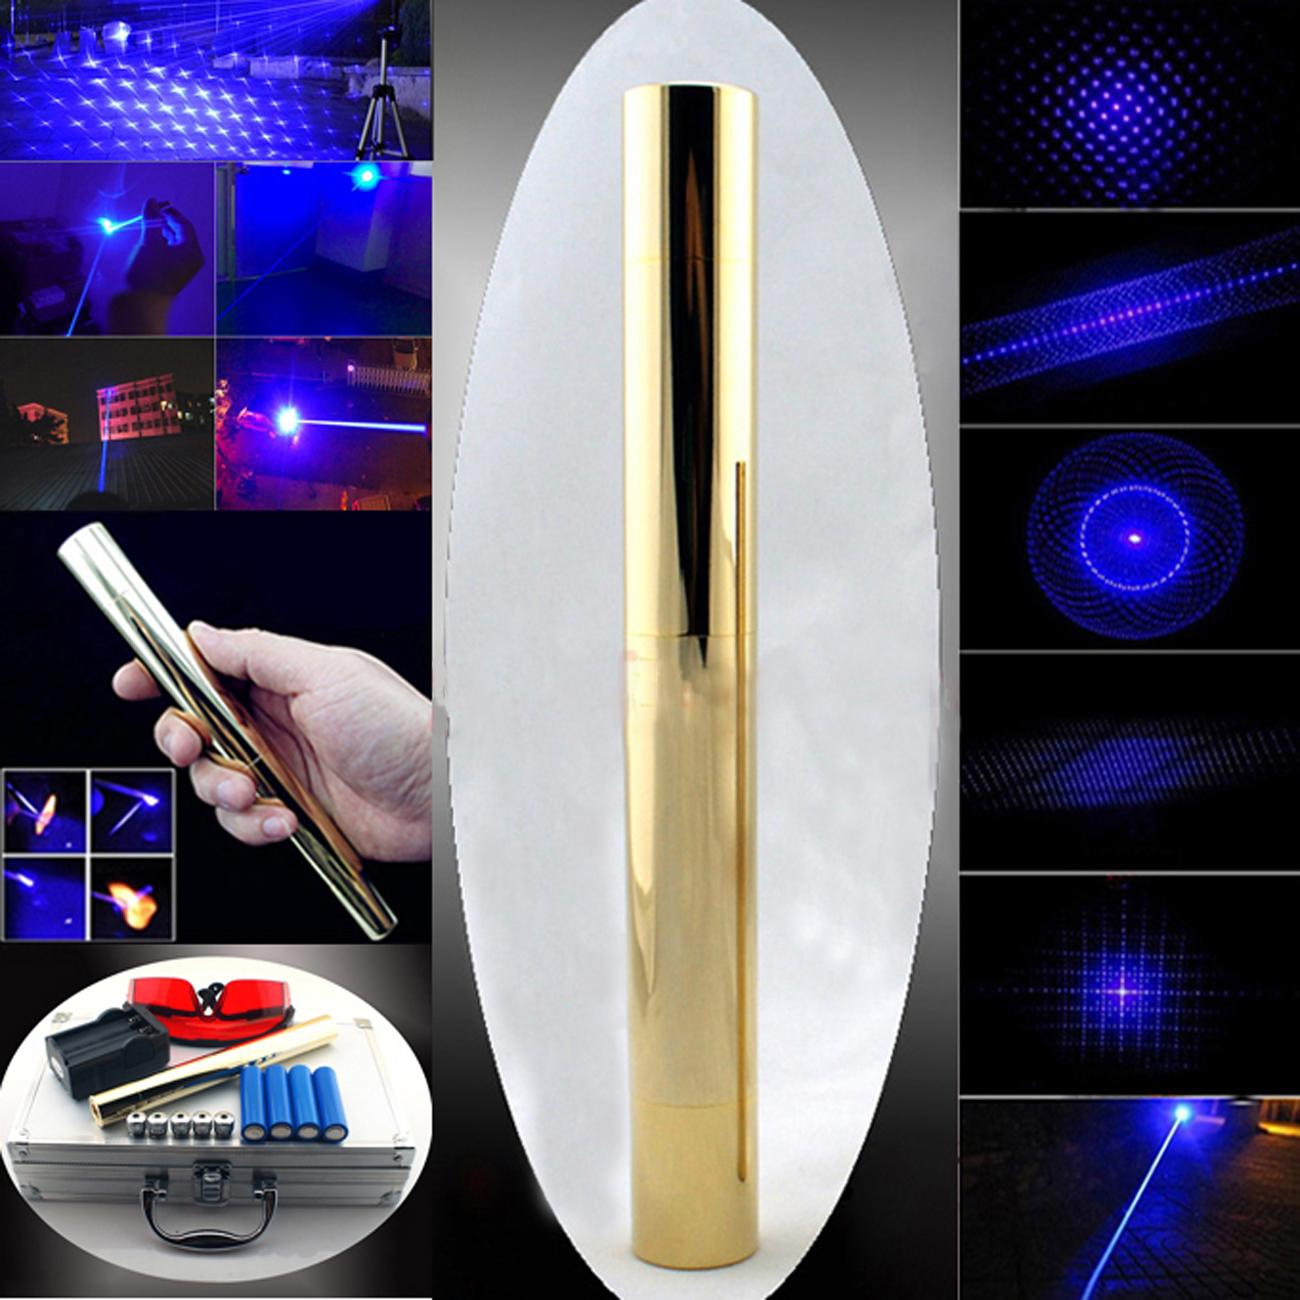 Laser Pointer Blue Portable Efficient